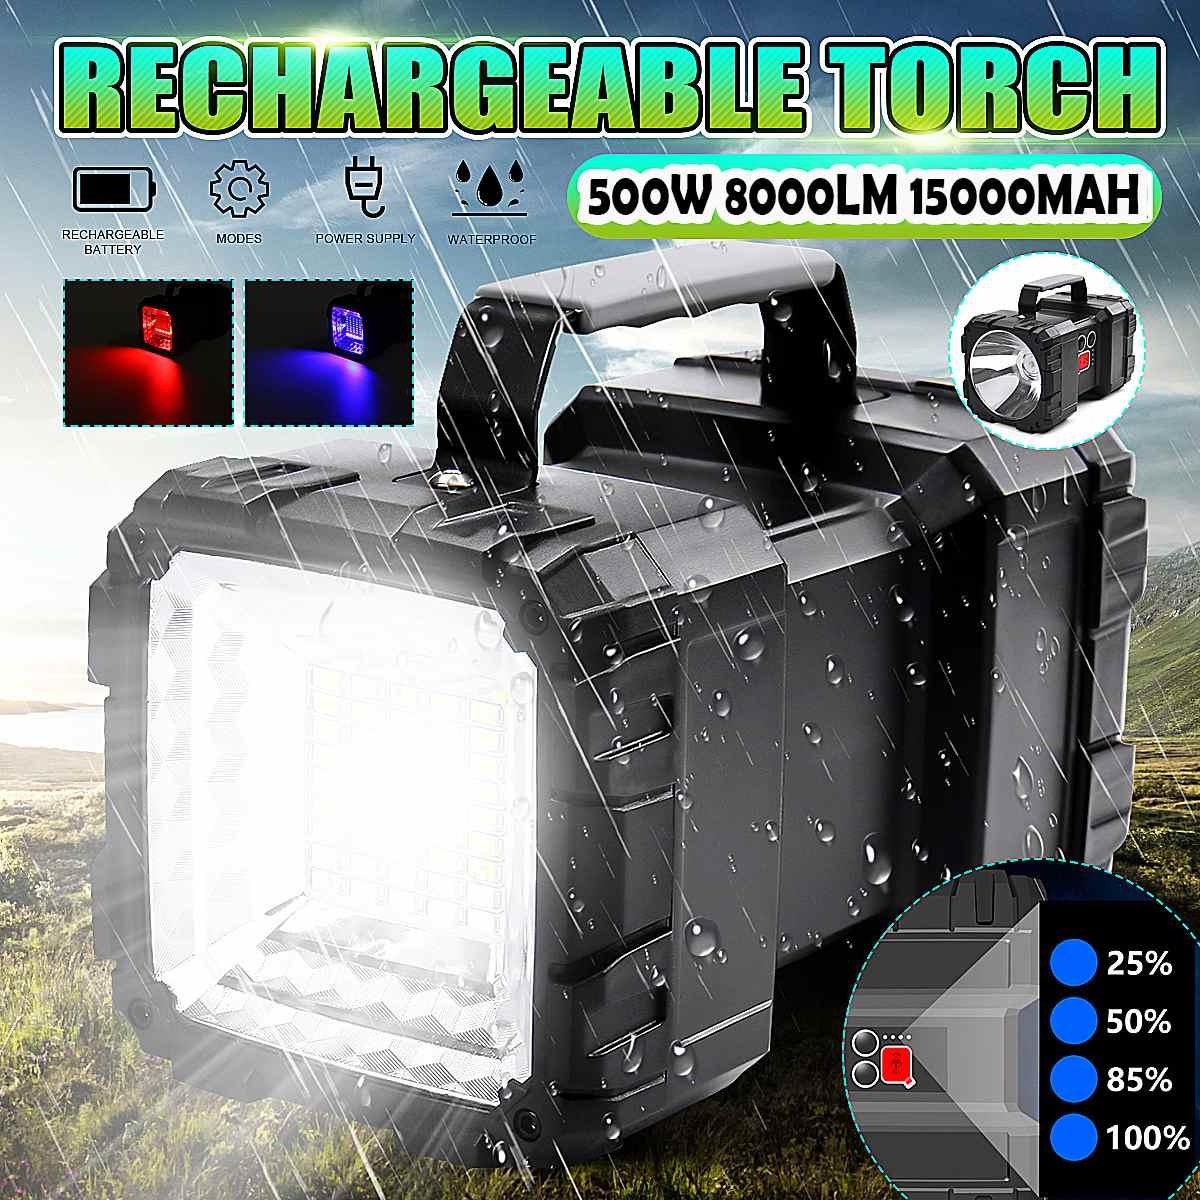 8000LM USB Charging LED Work Light Torch 15000mAh Battery Spotlight Hand Lamp Camping Lantern Searchlight For Fishing Hunting